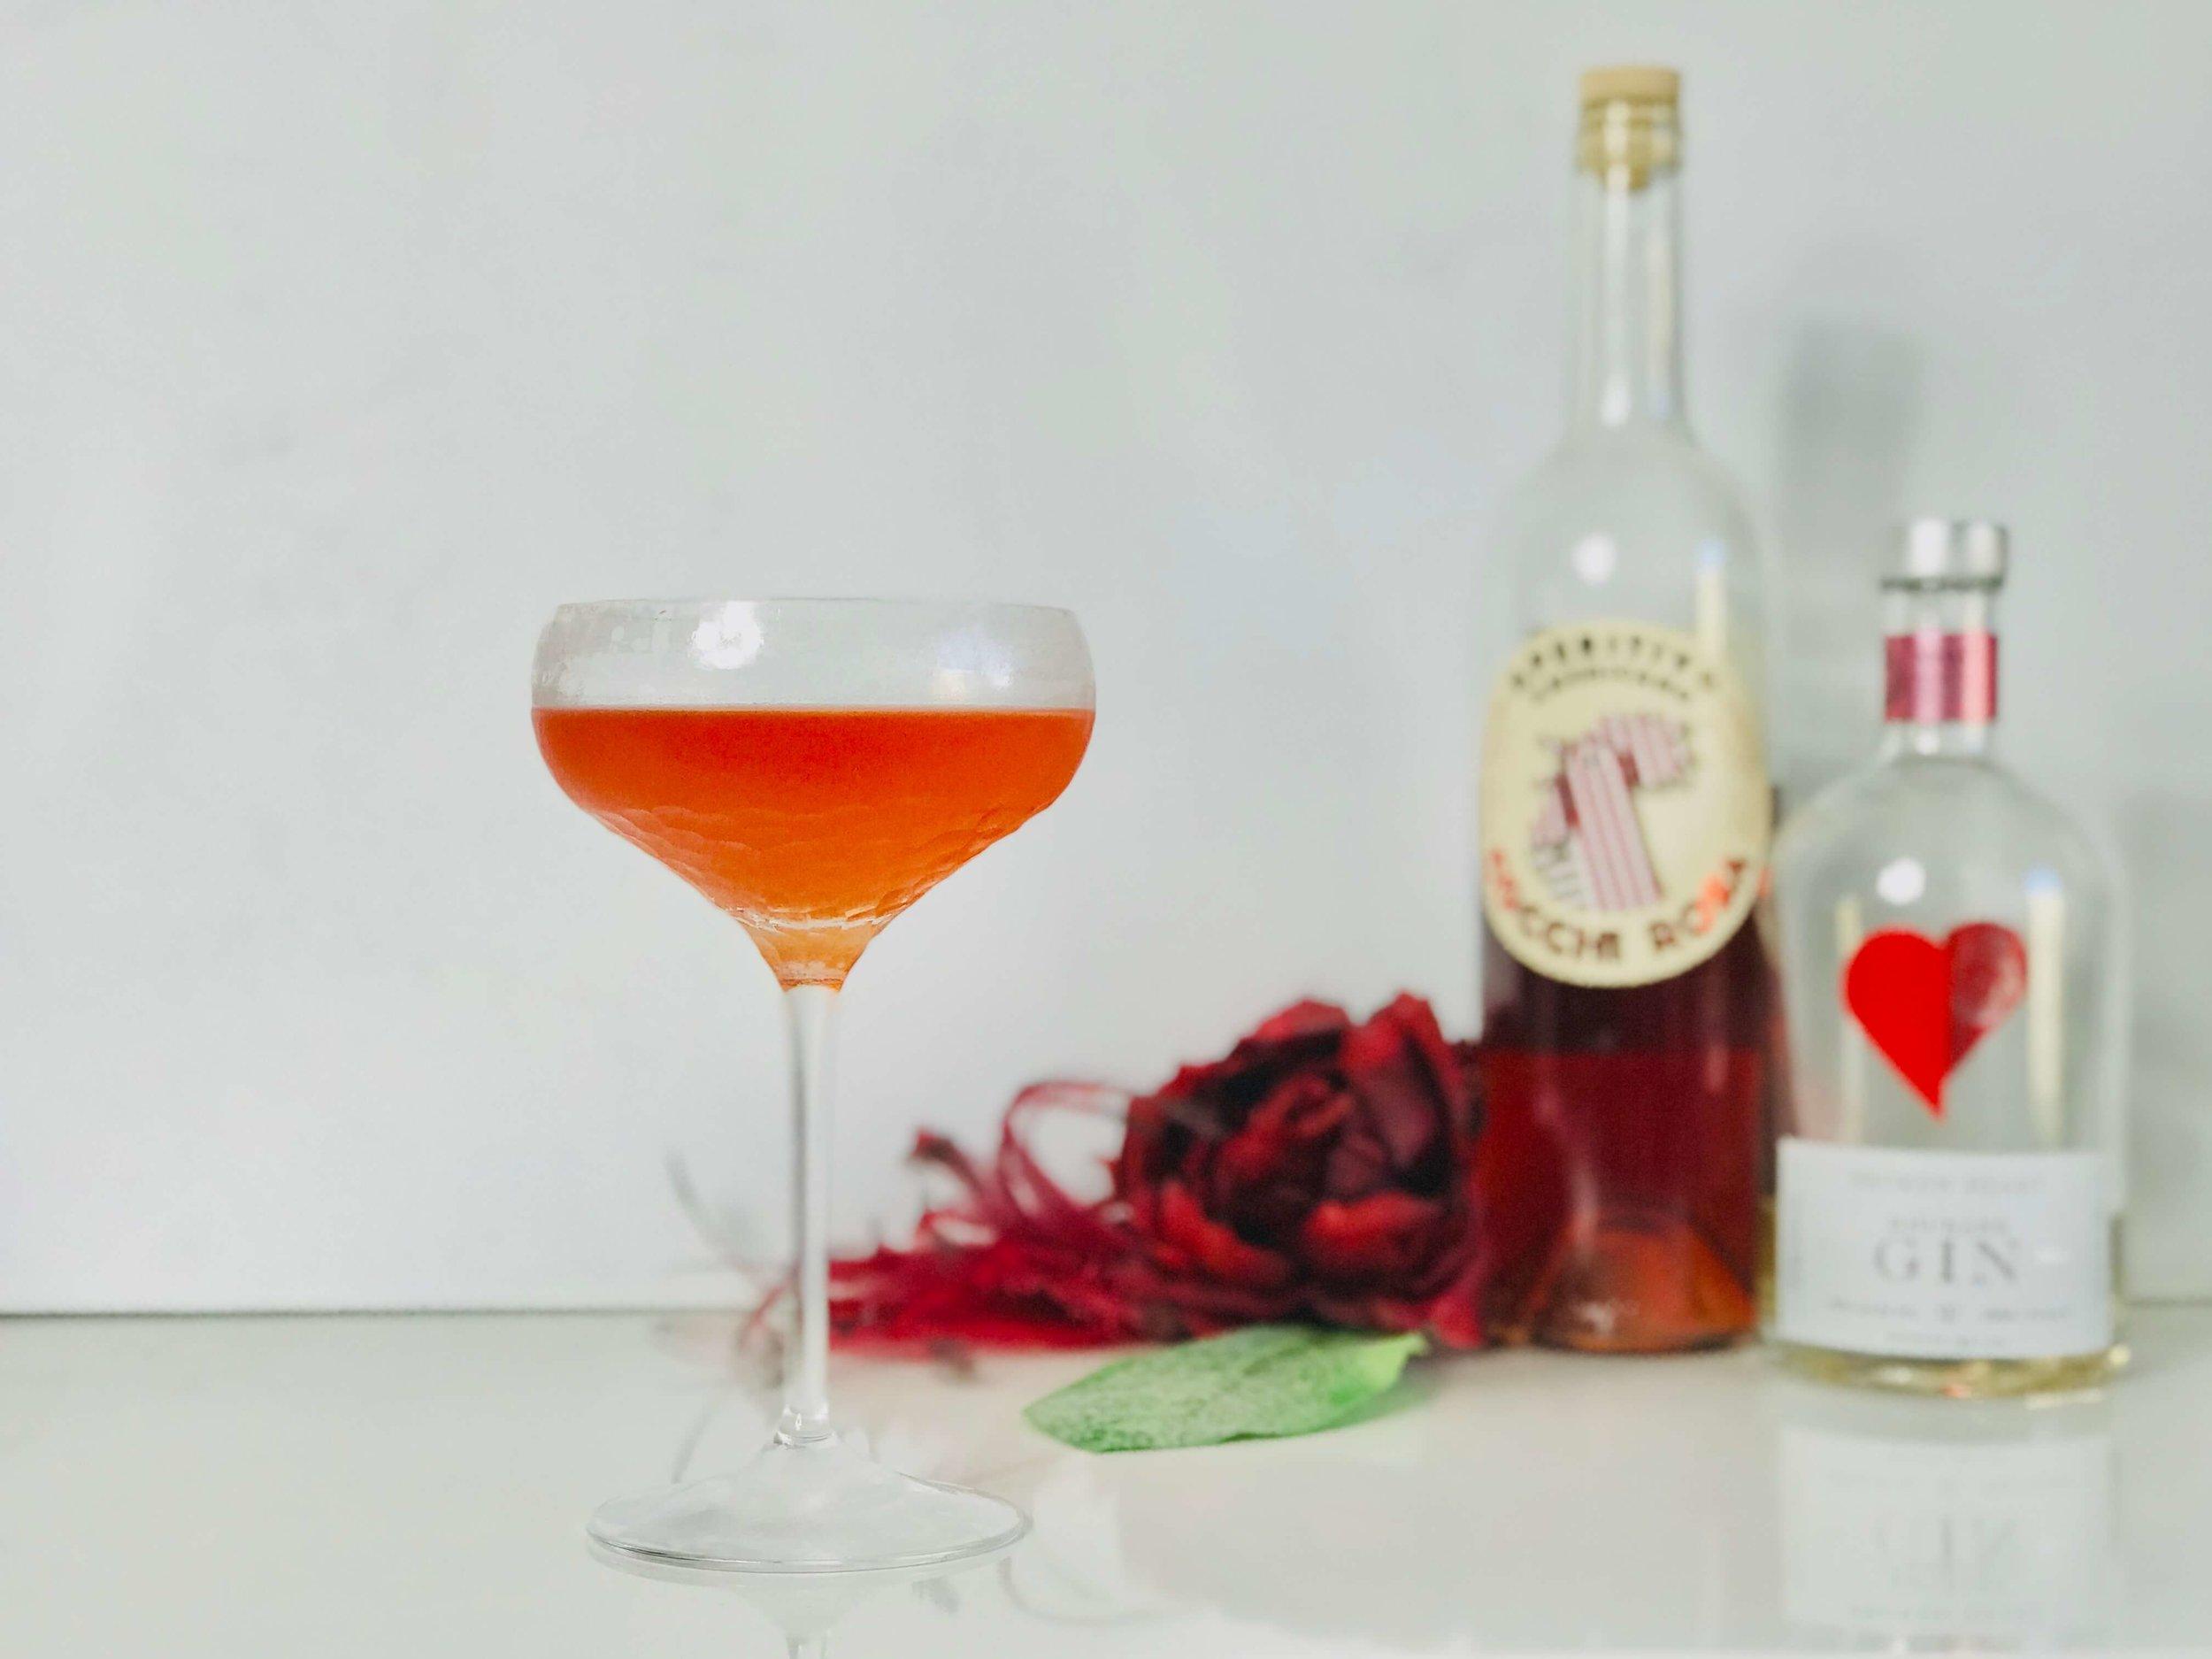 Rhubarb Gin Cocchi Rosa Cocktail